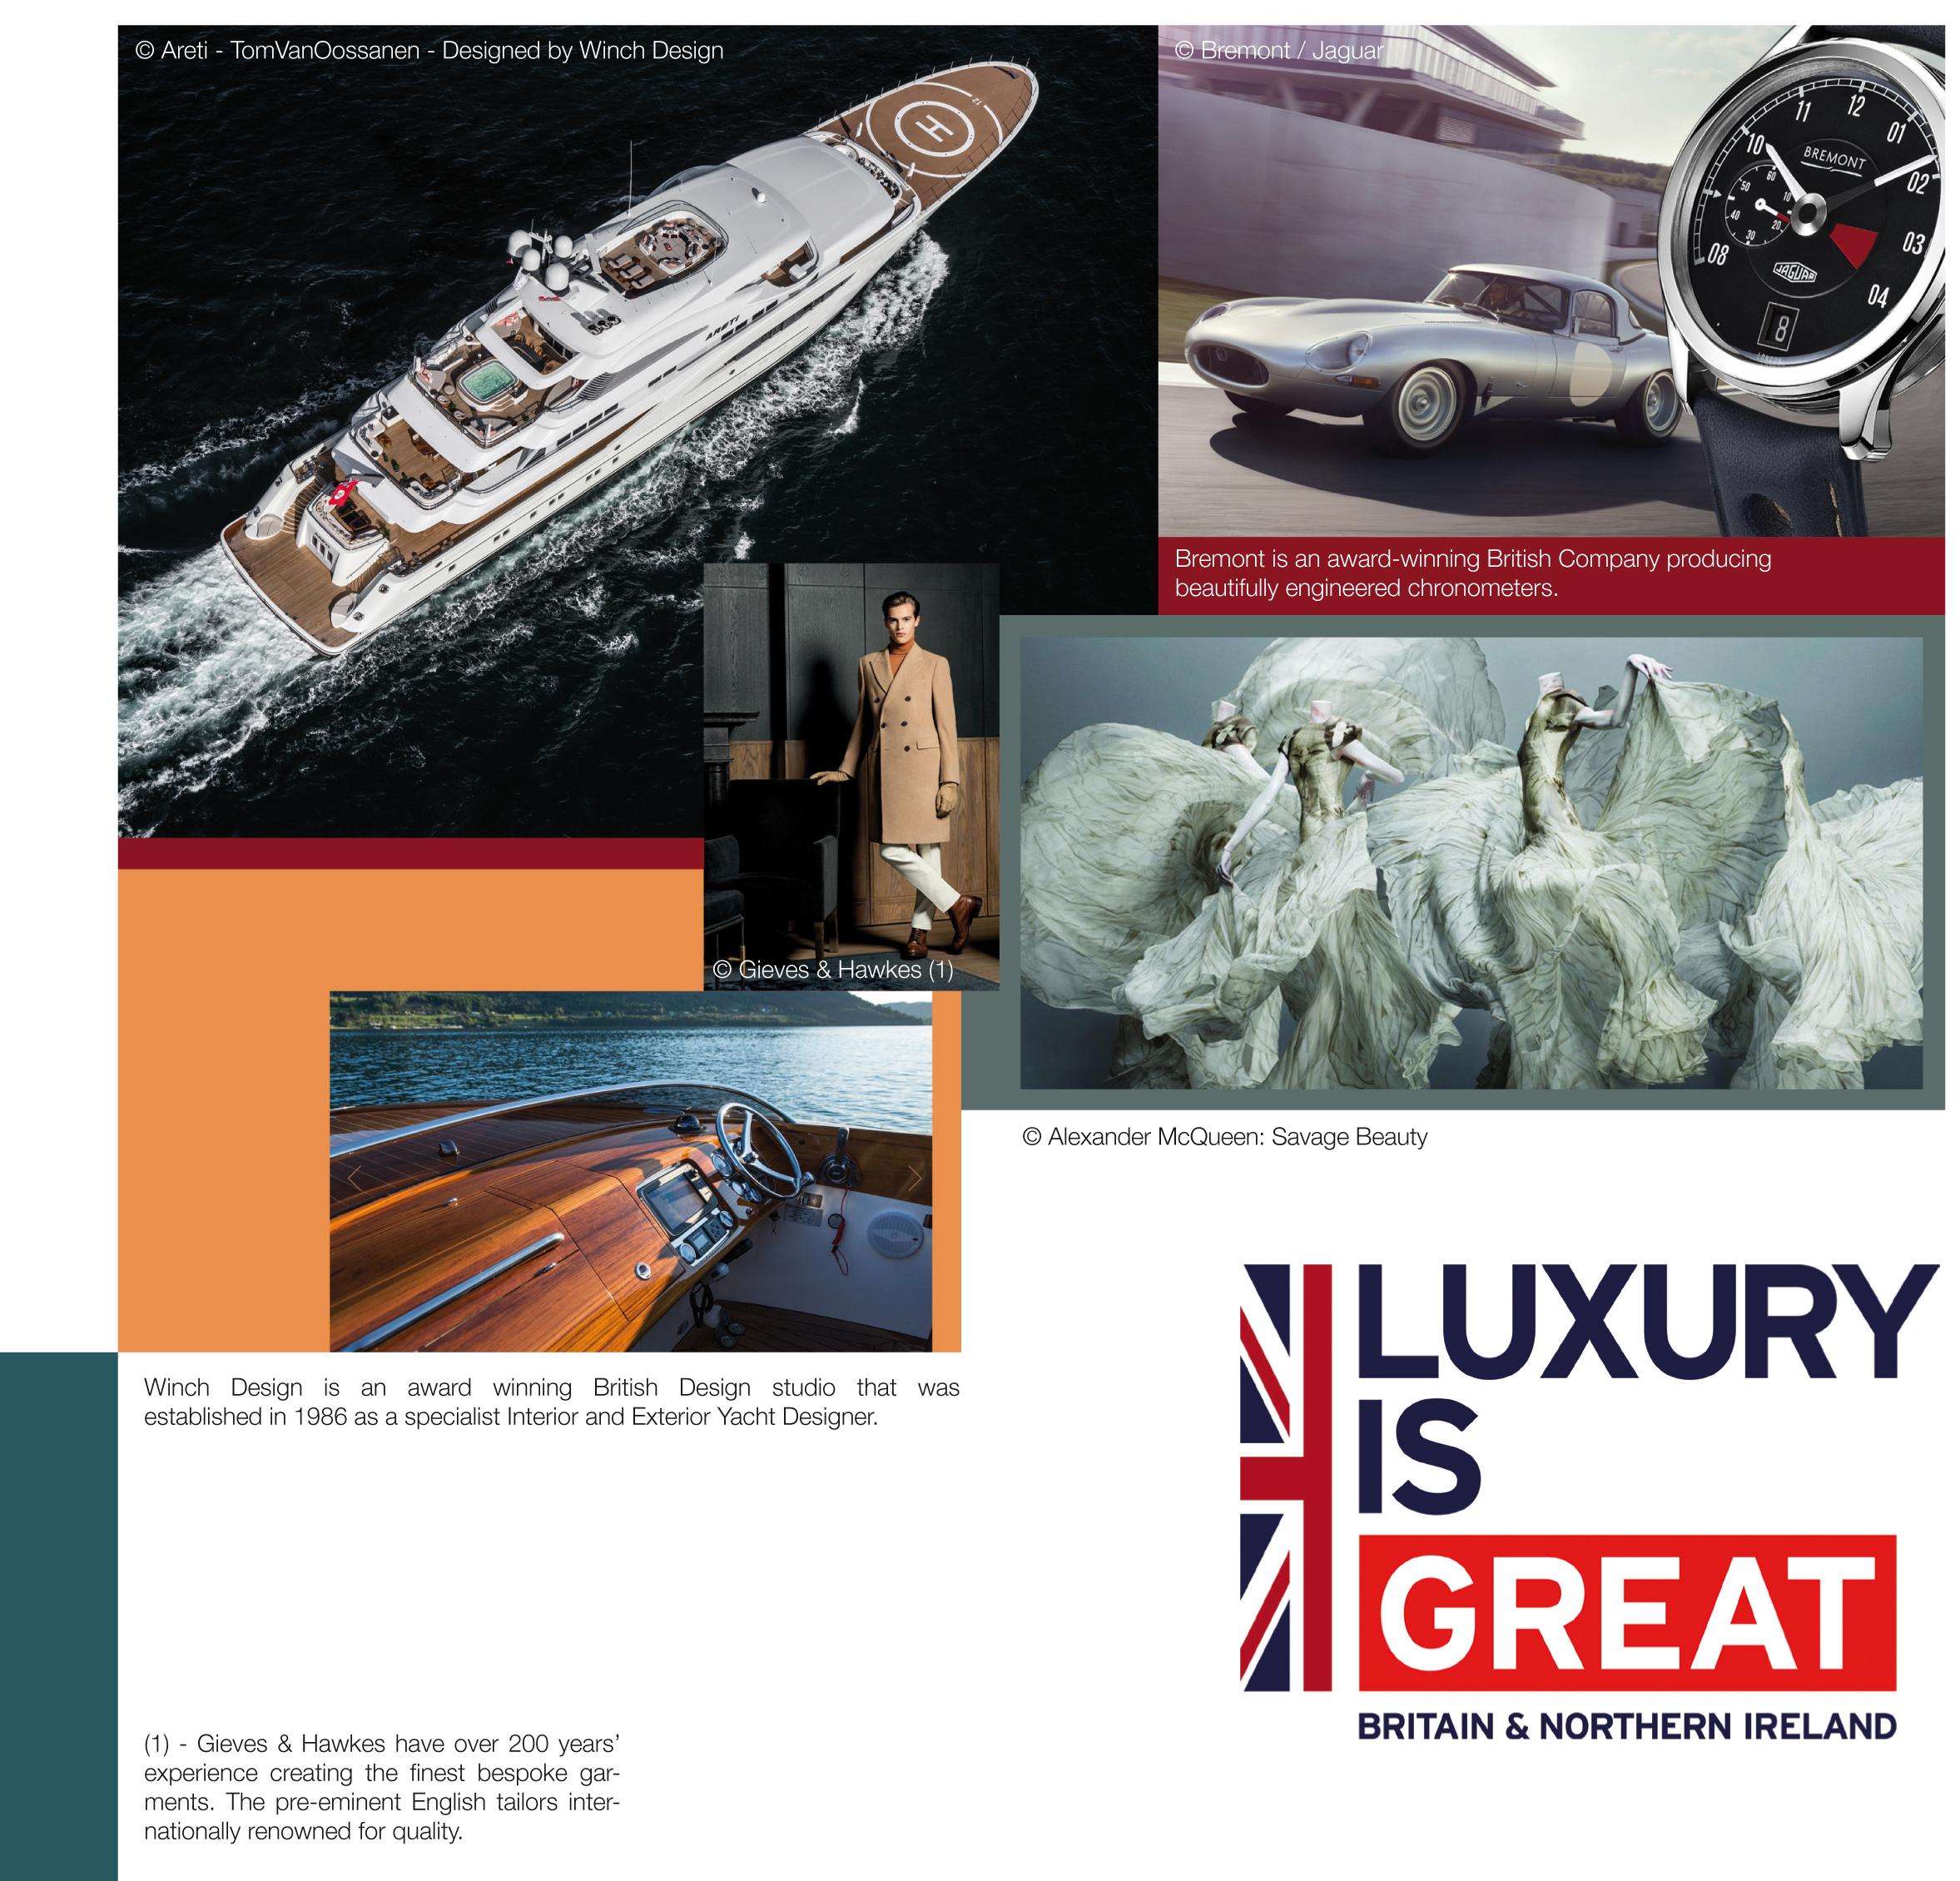 The UK's Luxury sector -